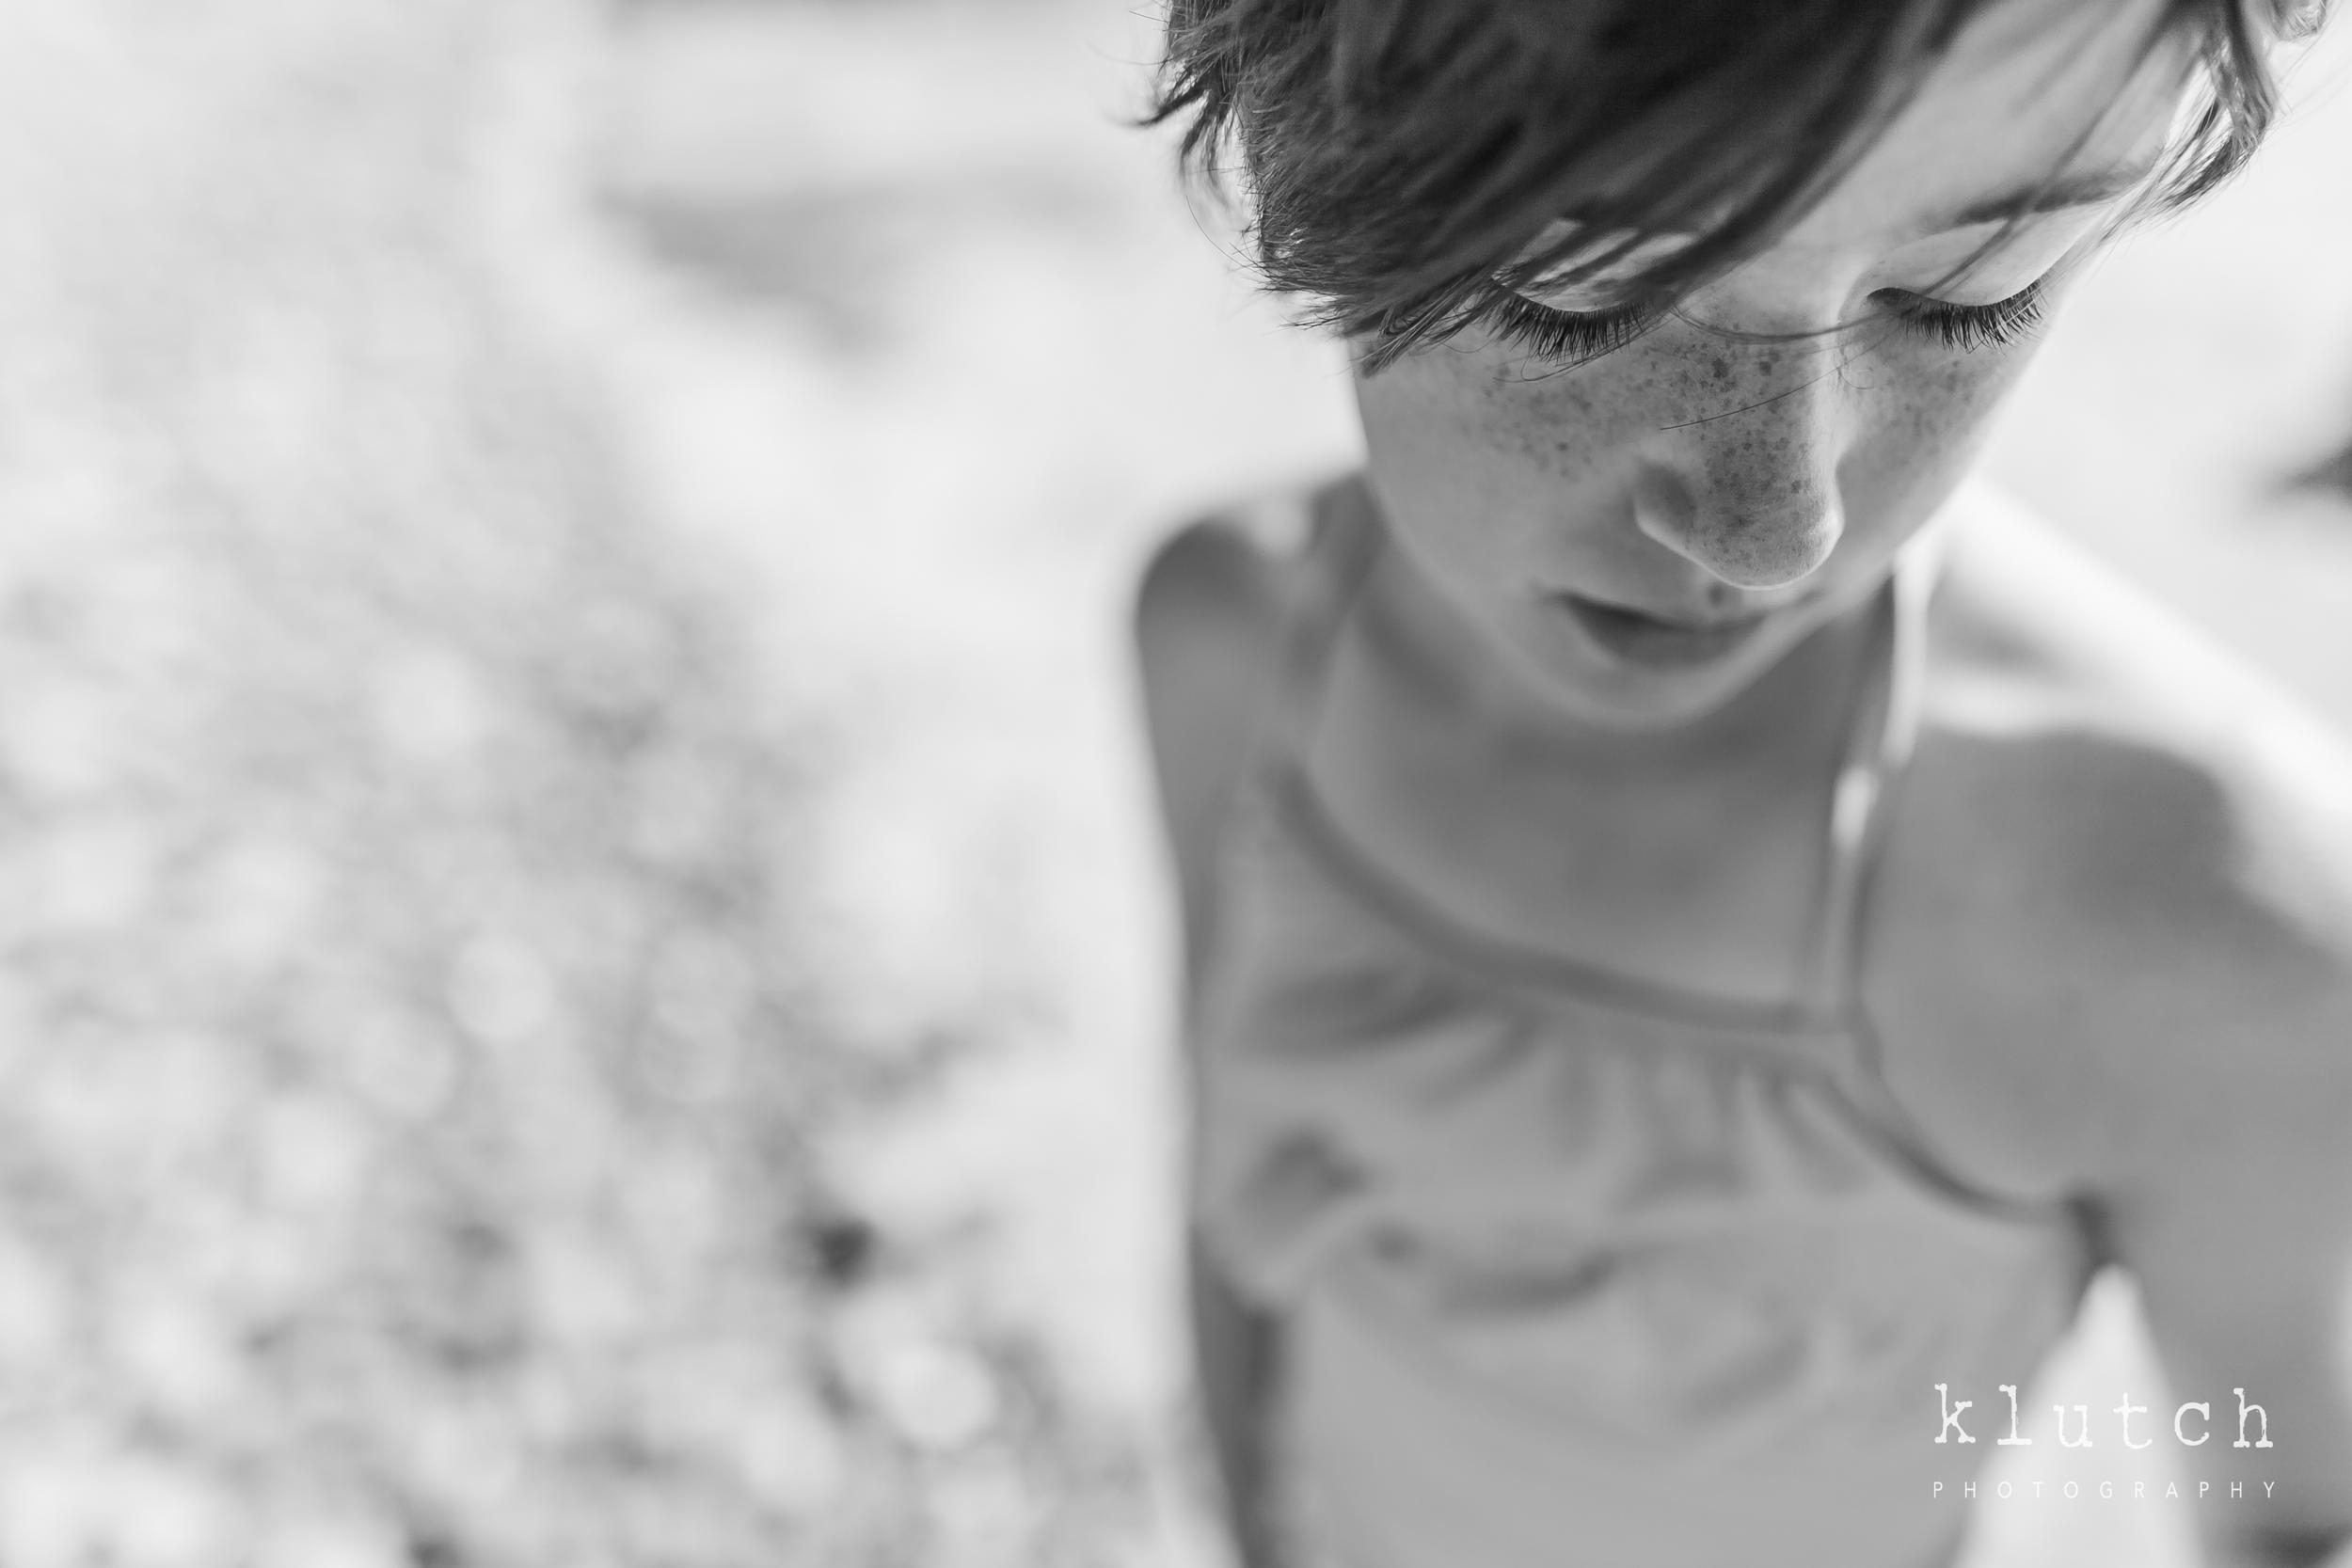 Klutch Photography,white rock family photographer, vancouver family photographer, whiterock lifestyle photographer, life unscripted photographer, life unscripted session, photography,Dina Ferreira Stoddard-6030.jpg